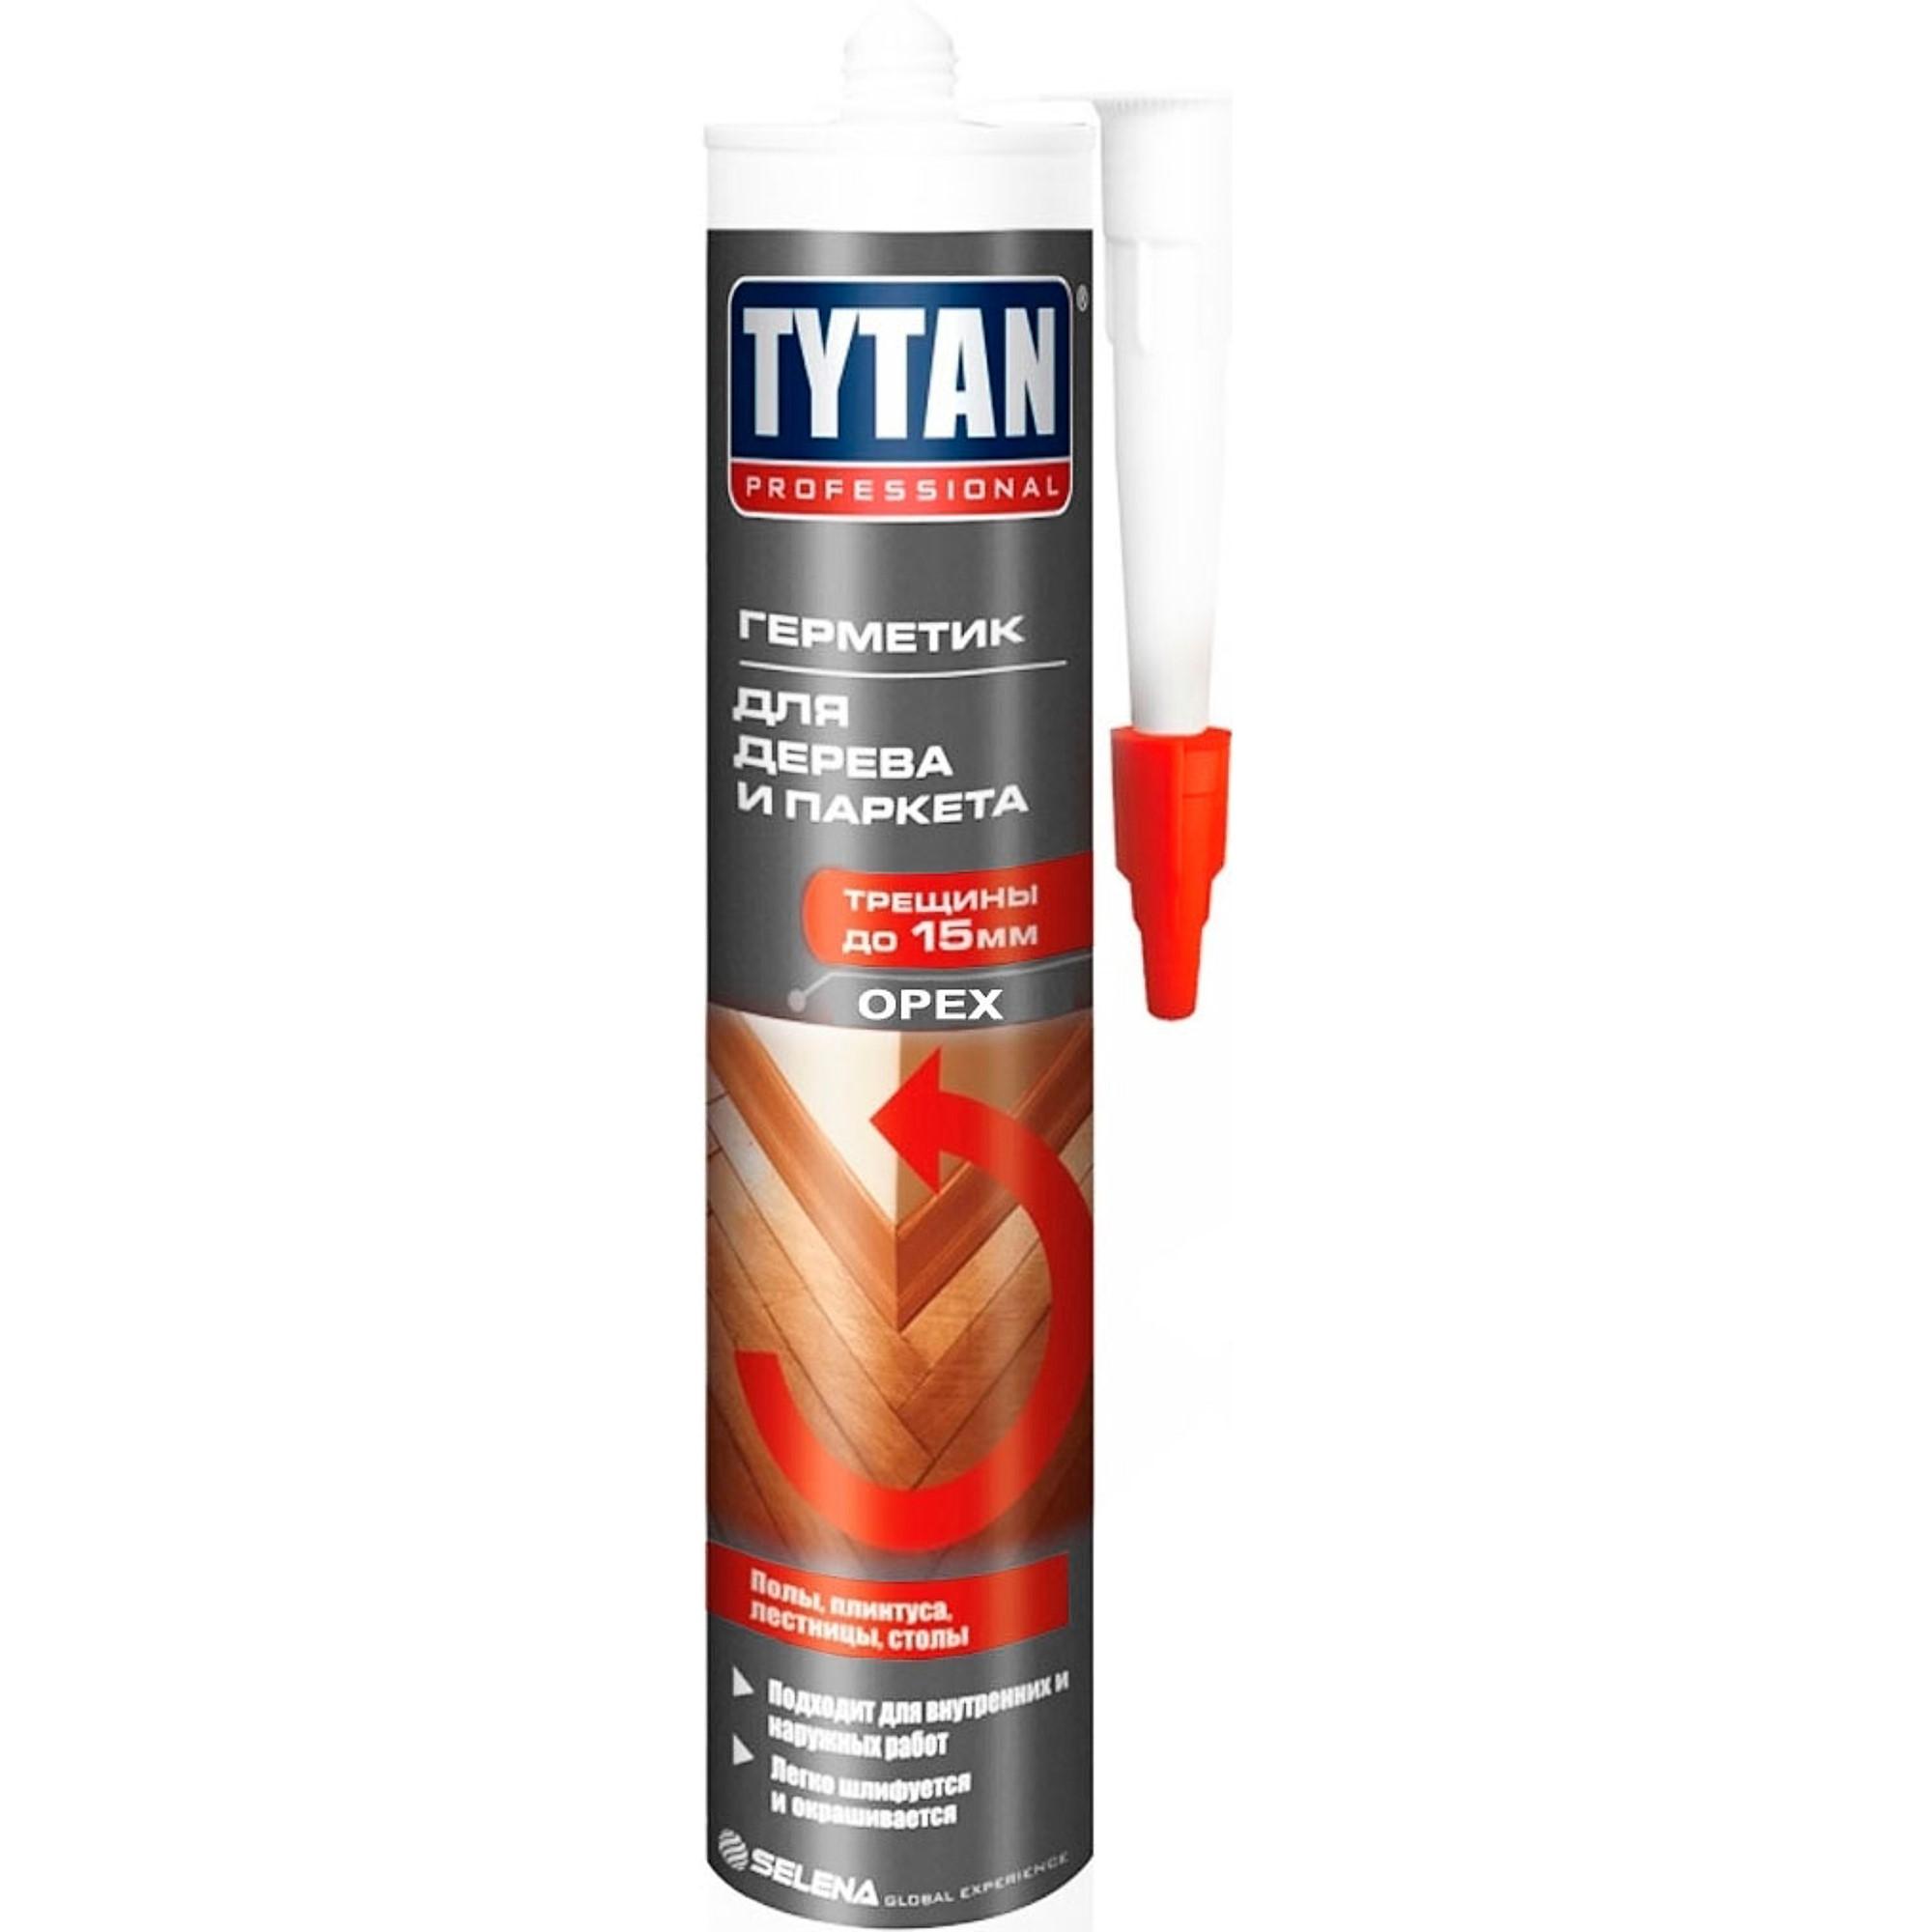 Герметик для древесины TYTAN орех 310мл - фото